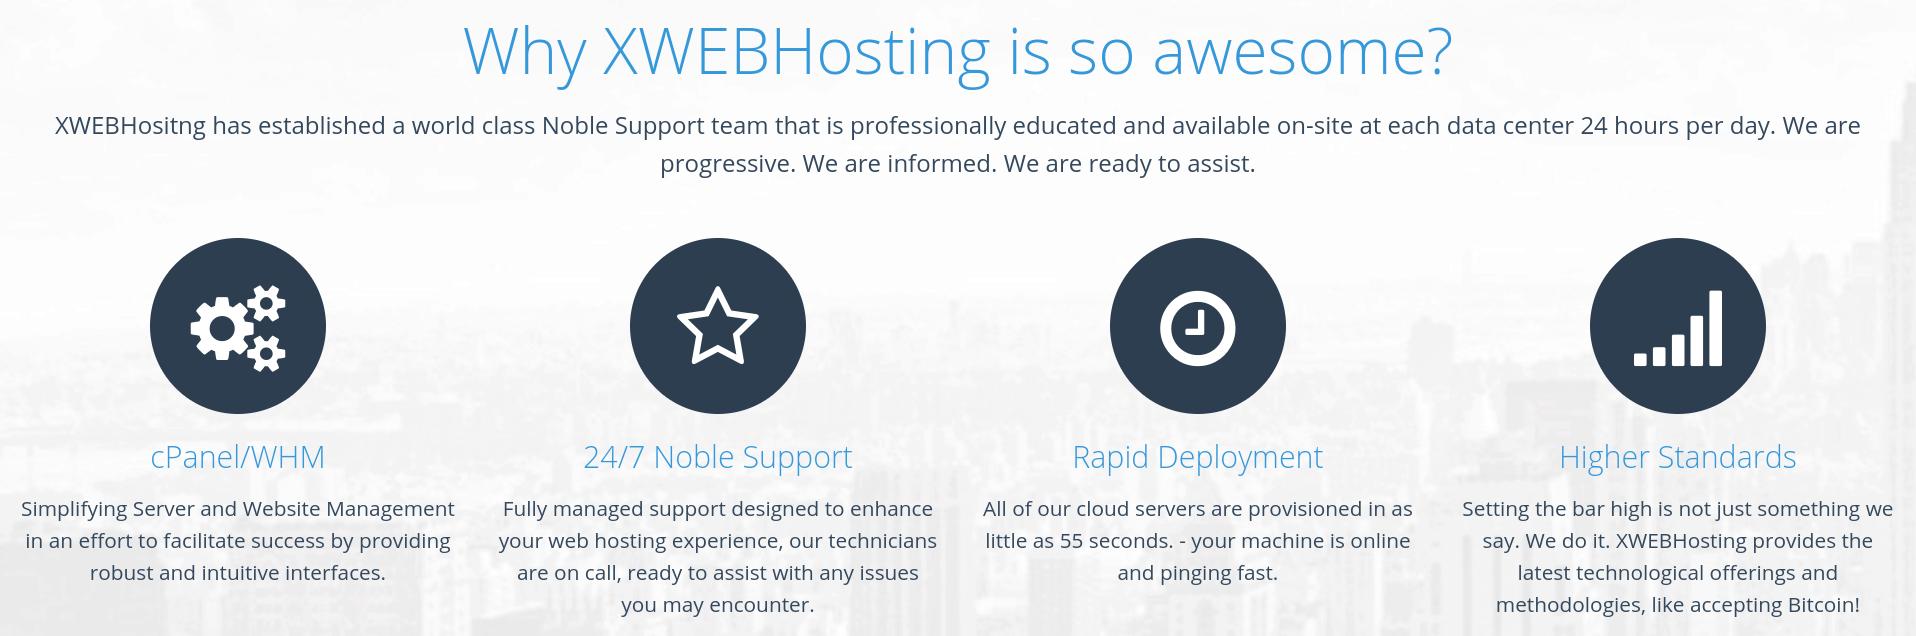 xwebhosting 1